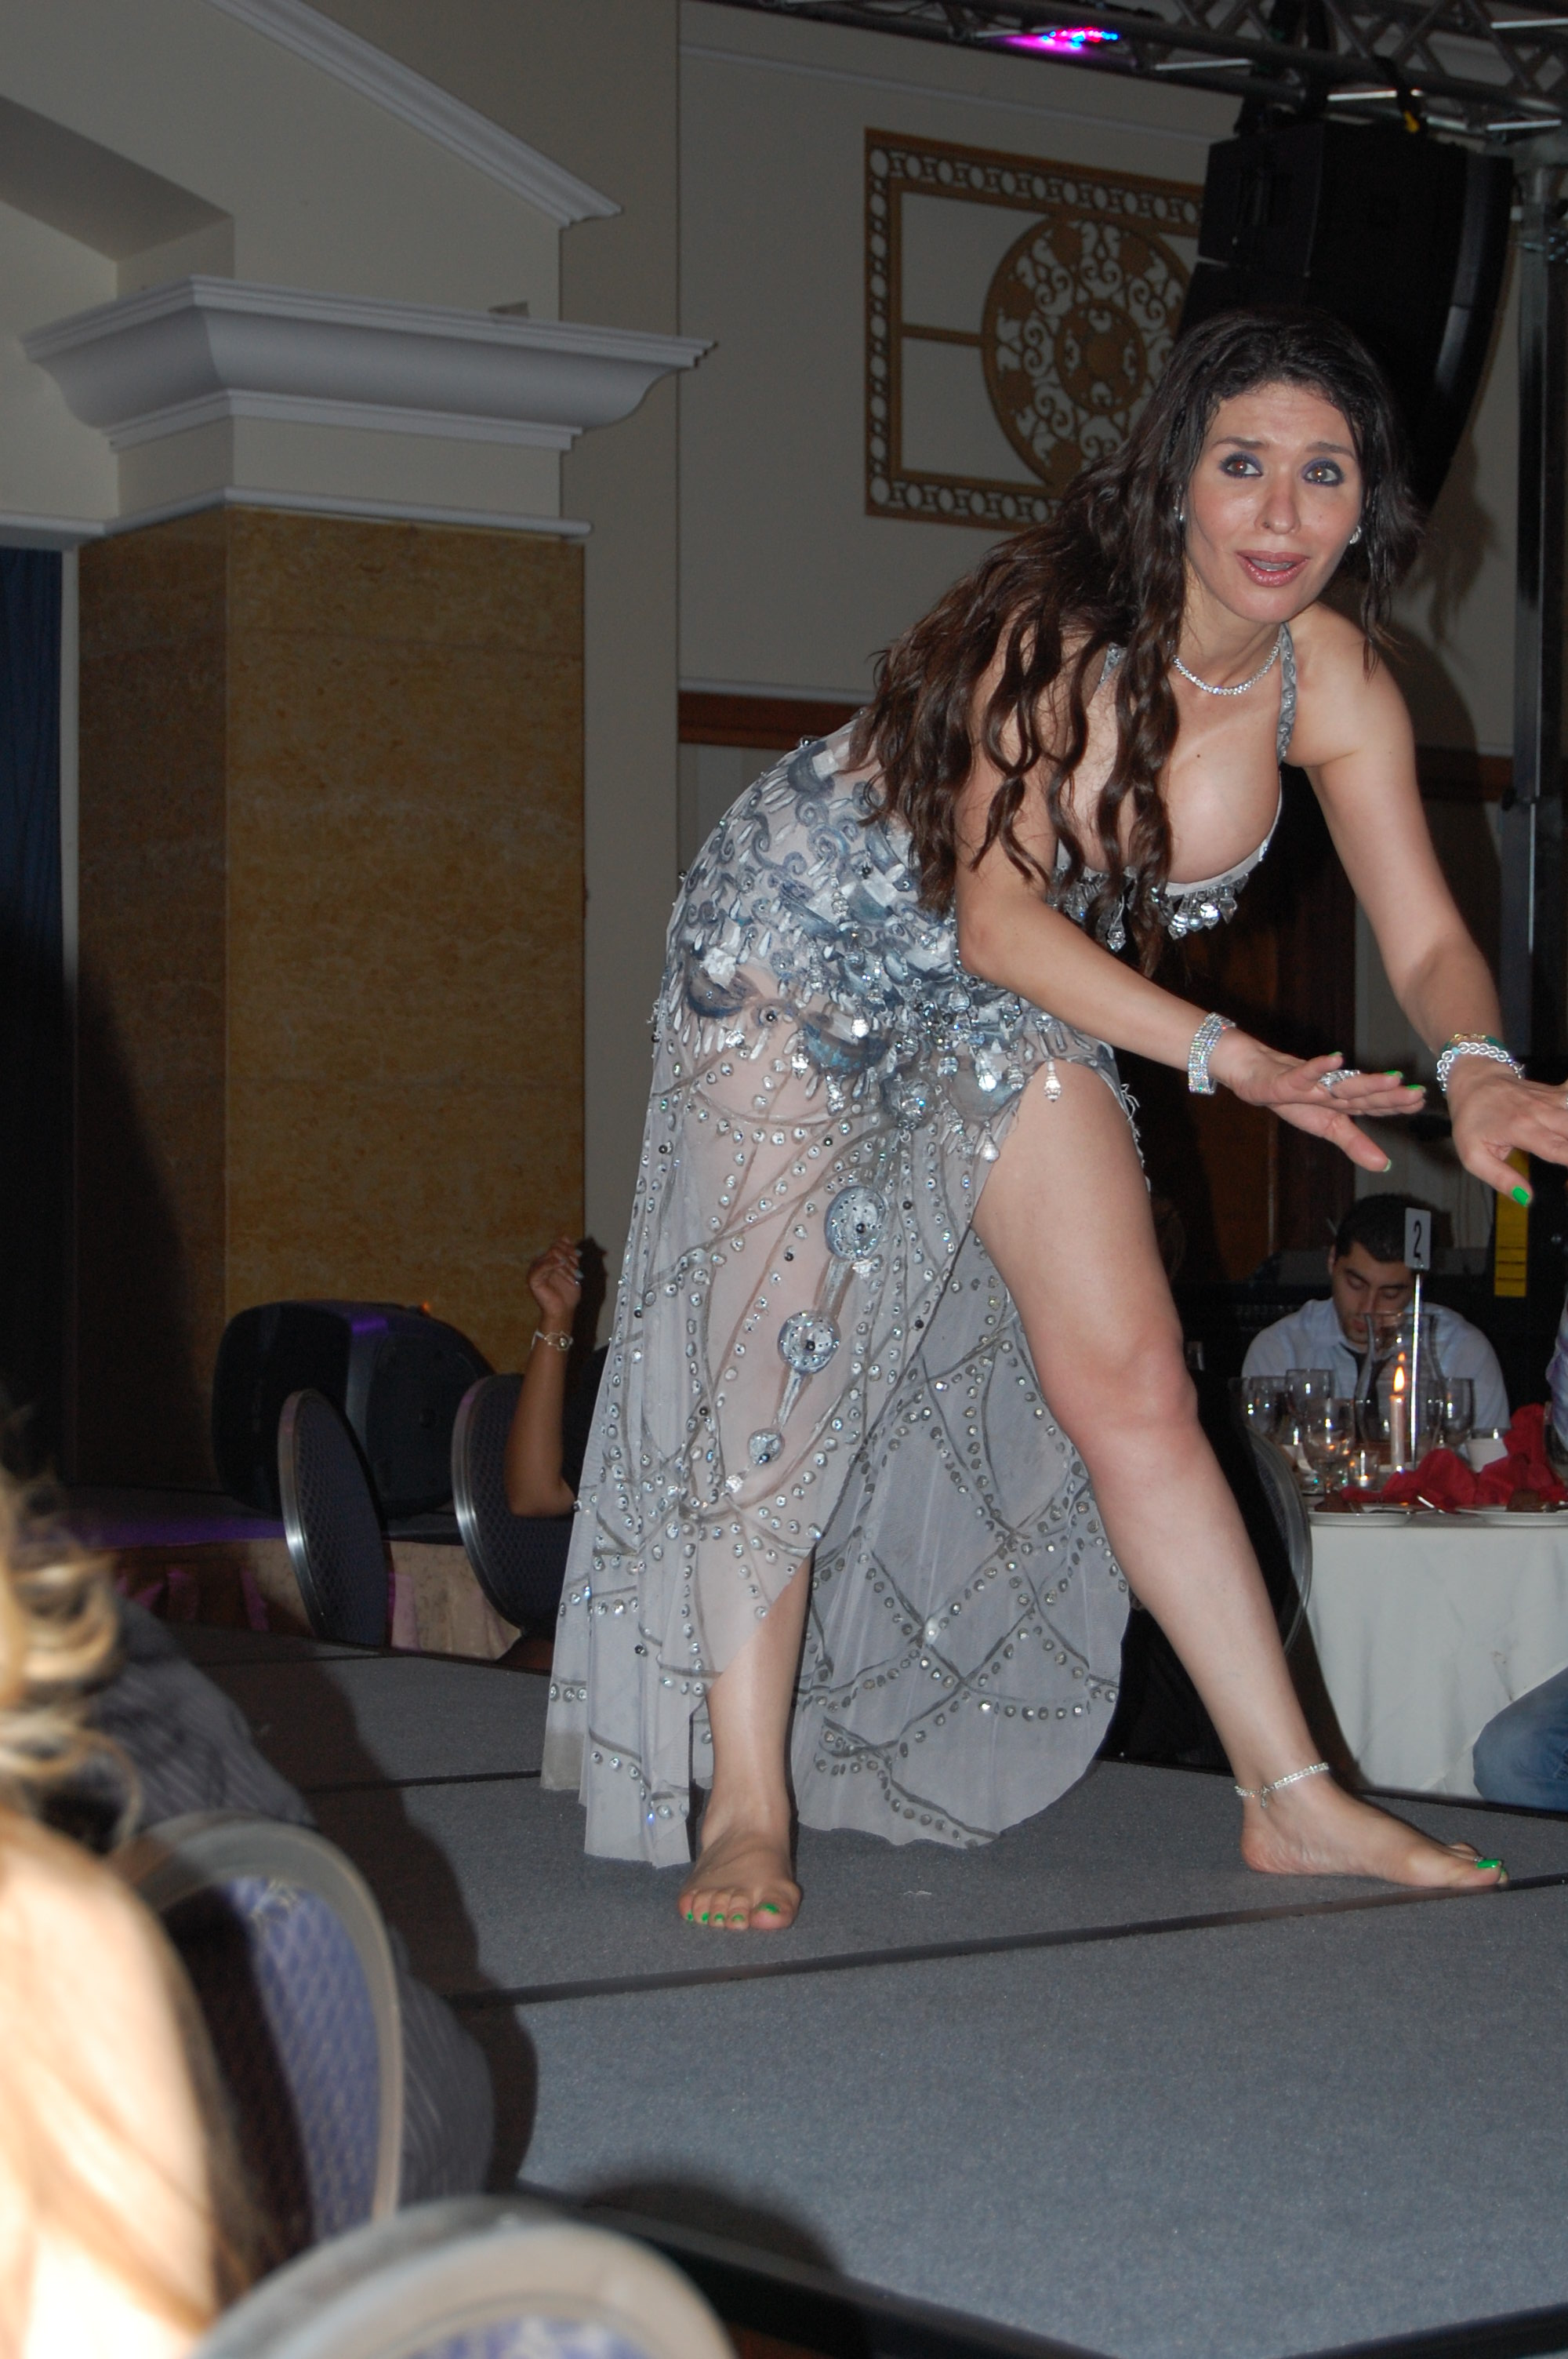 Cute Big Girl Wallpaper Dina In Dc Dancing Through Life